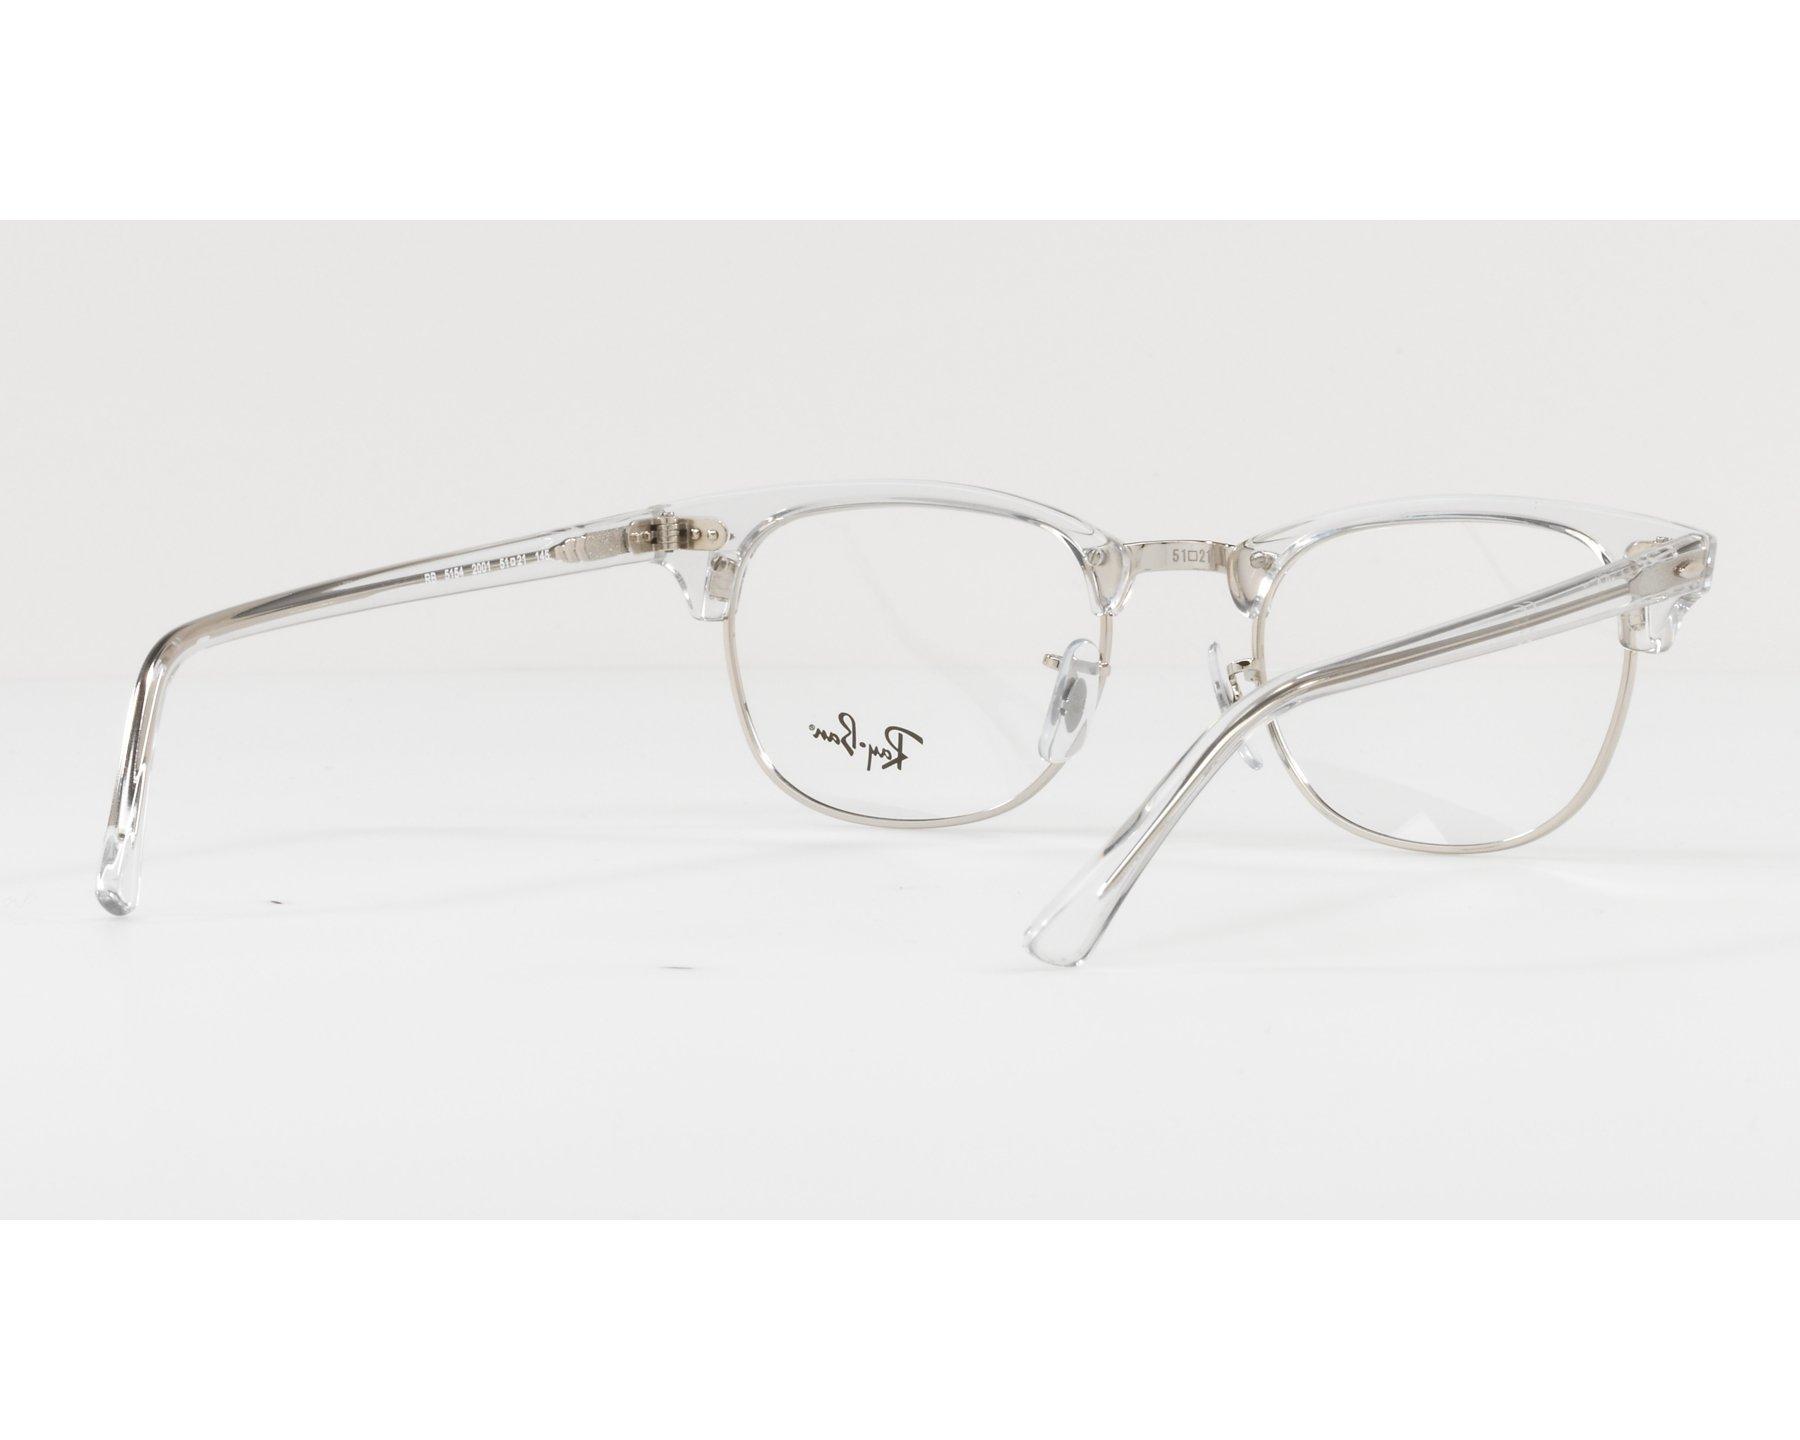 4298ea8cf8c68 eyeglasses Ray-Ban RX-5154 2001 49-21 Crystal Silver 360 degree view